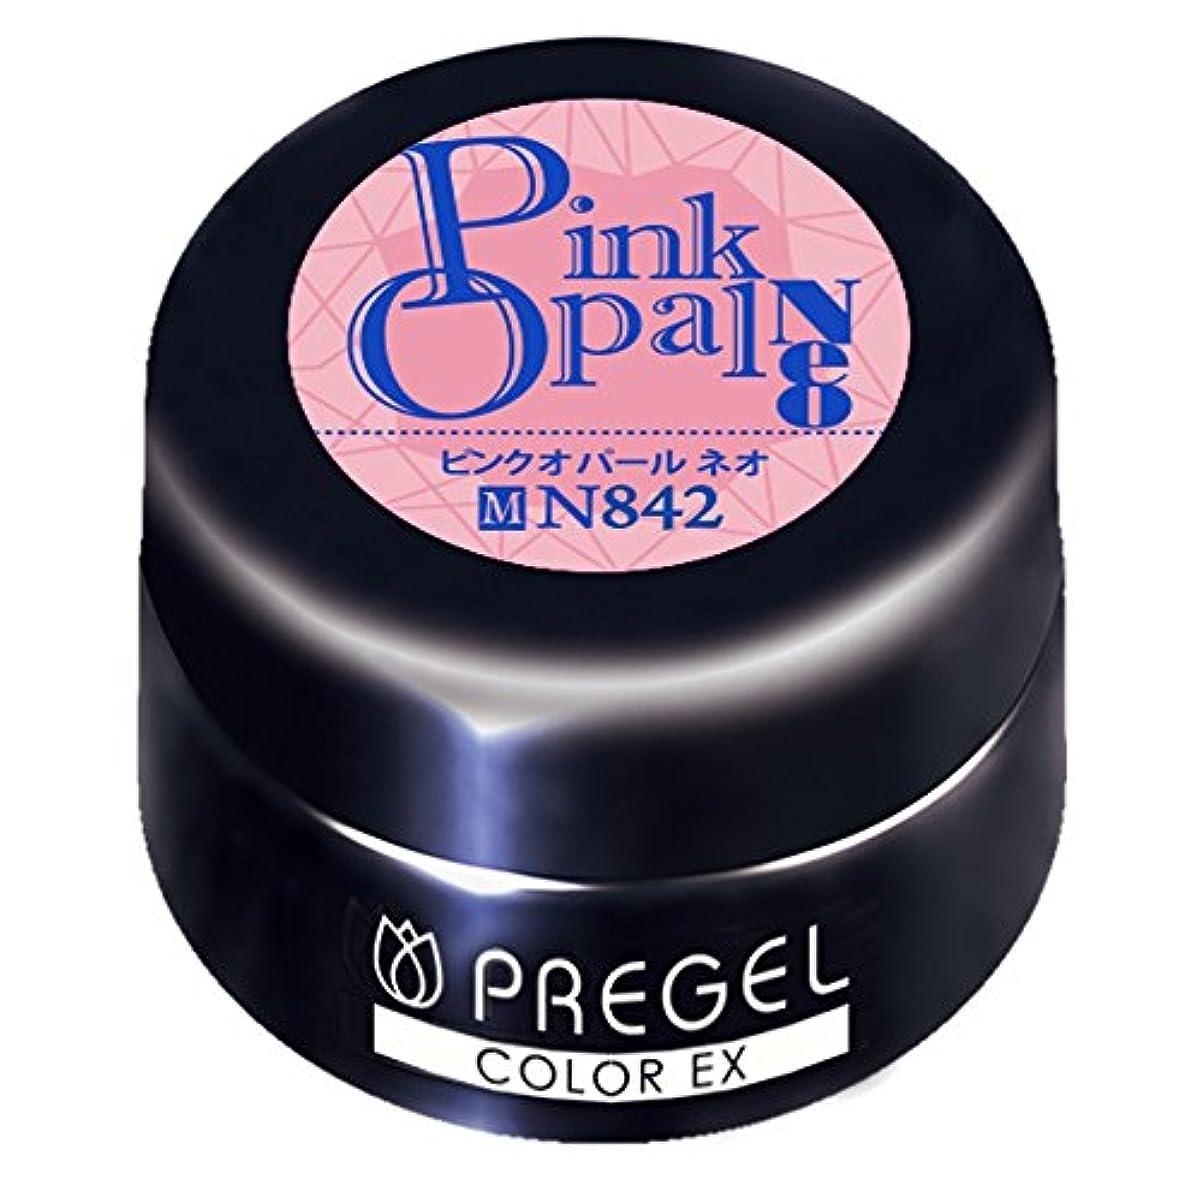 PRE GEL カラーEX ピンクオパールneo842 3g UV/LED対応